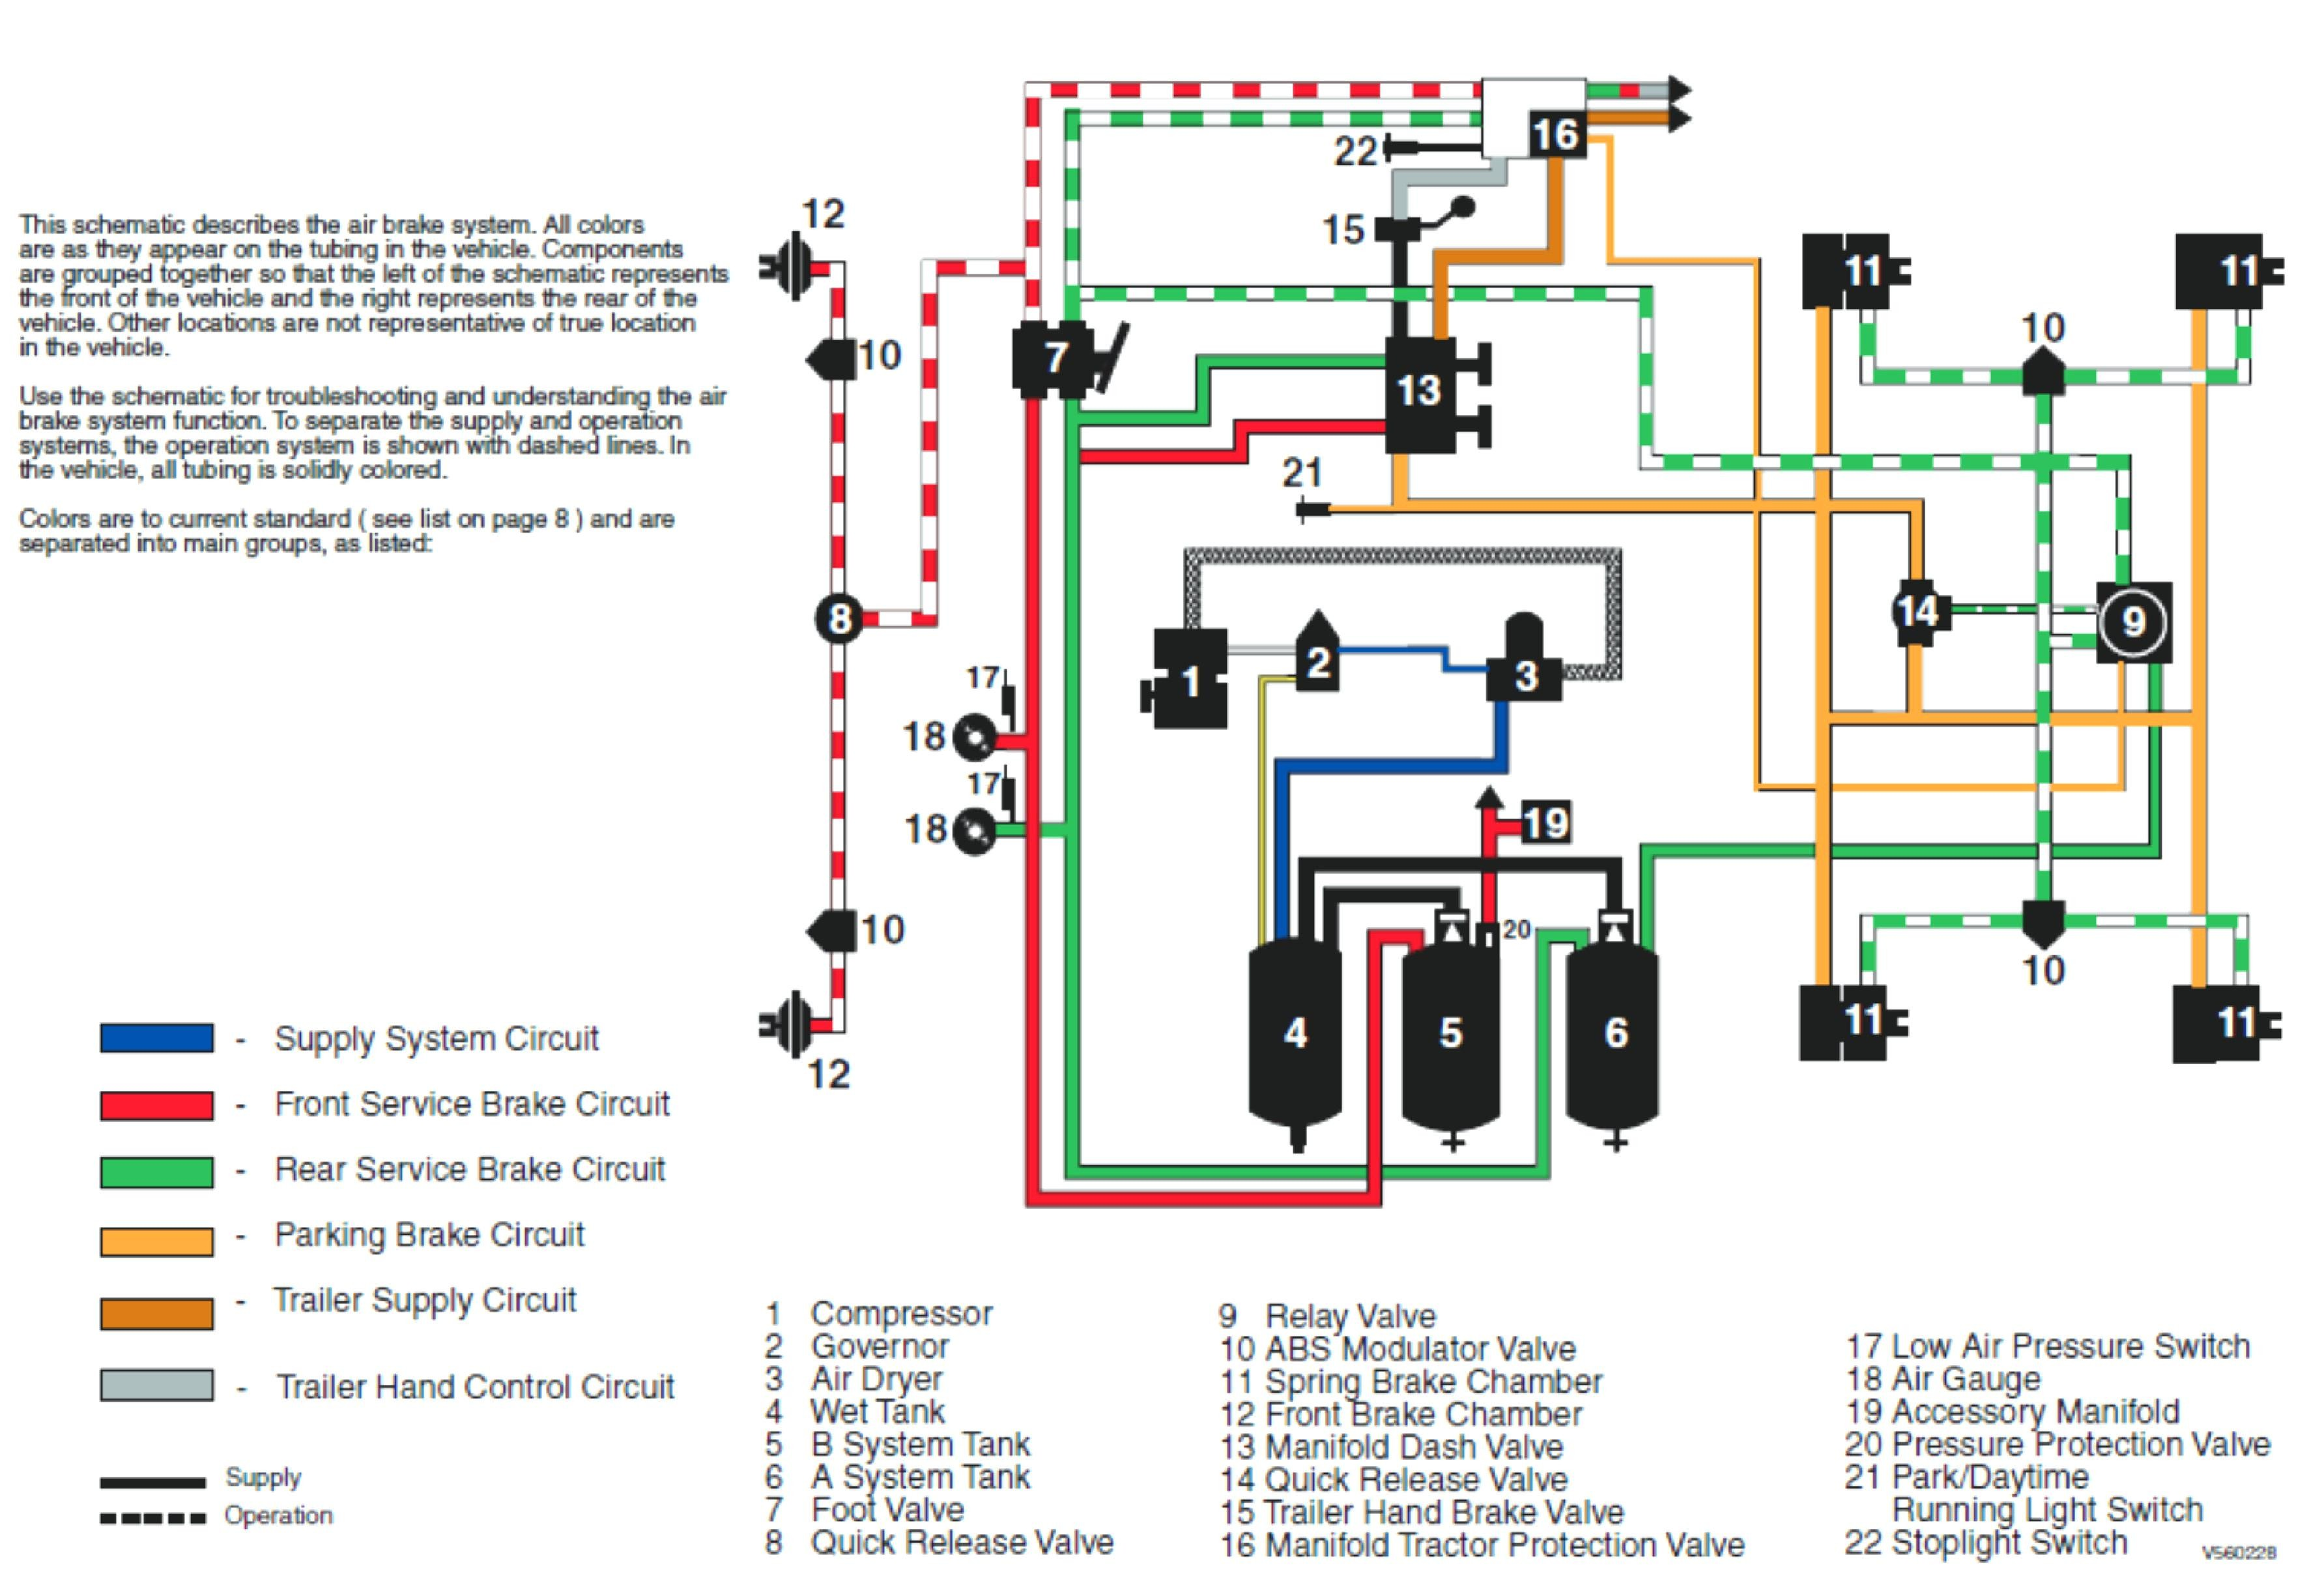 Freightliner Air Brake System Diagram Travel Trailer Battery Hookup Diagram  Tractor Air Brake System Of Freightliner